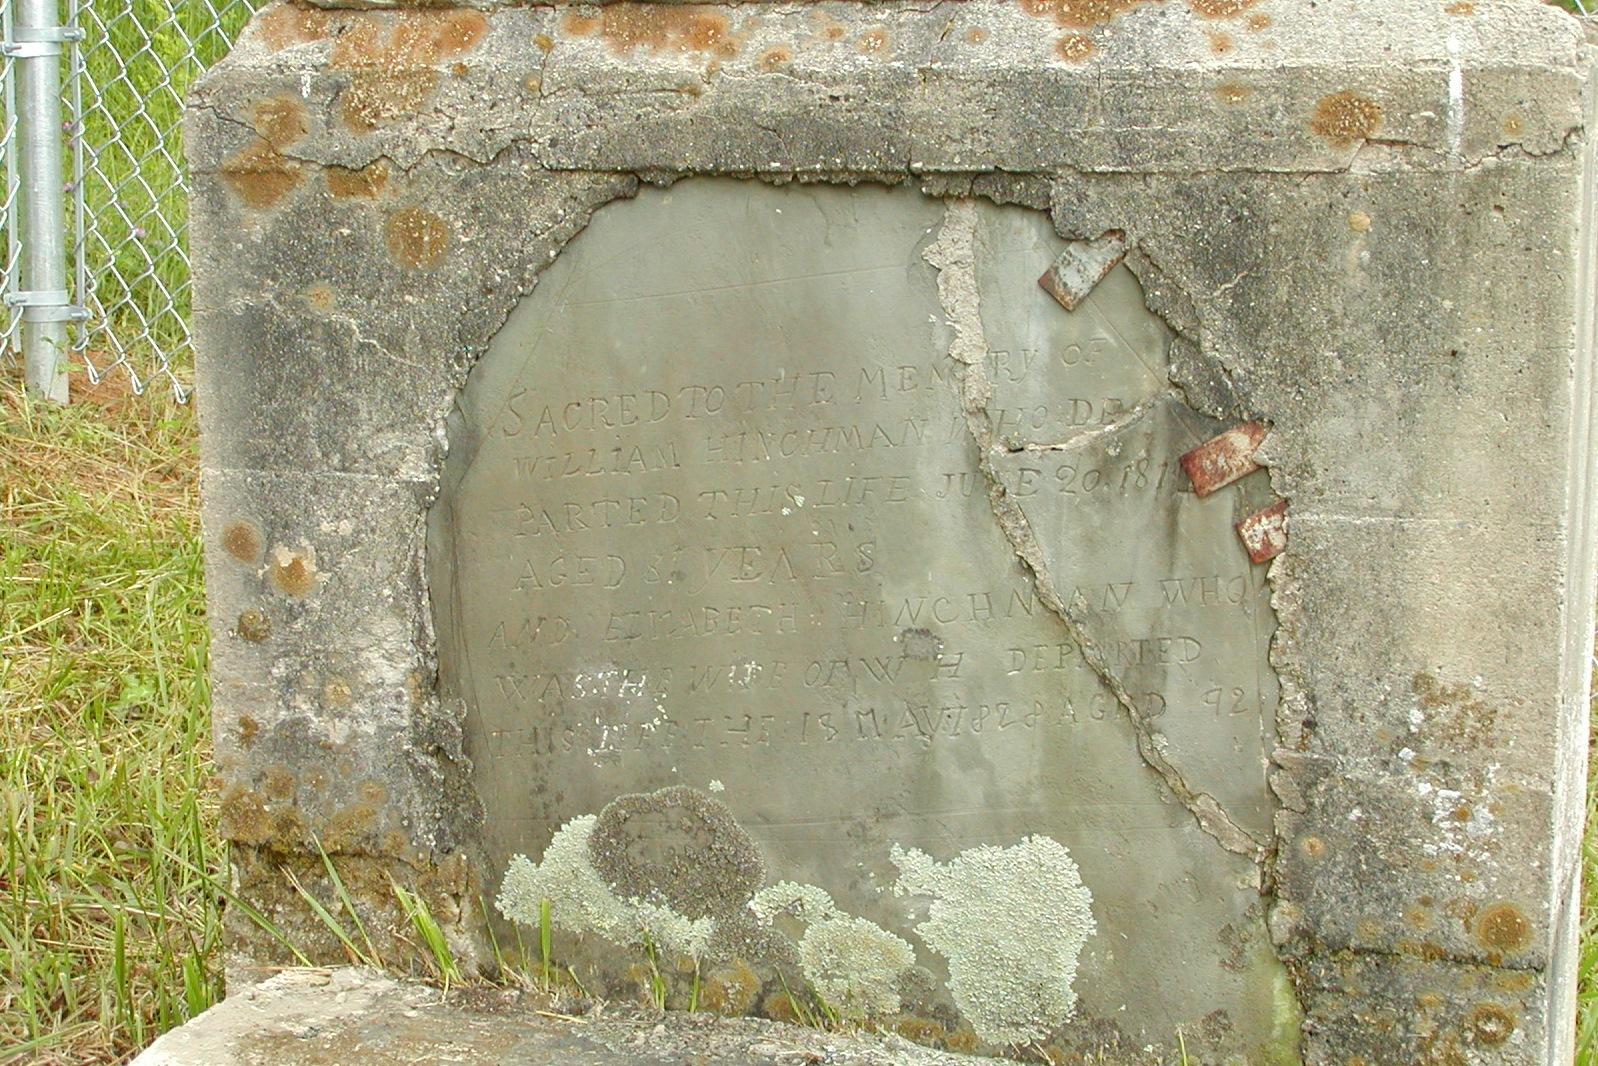 William and Elizabeth Hinchman Grave Site